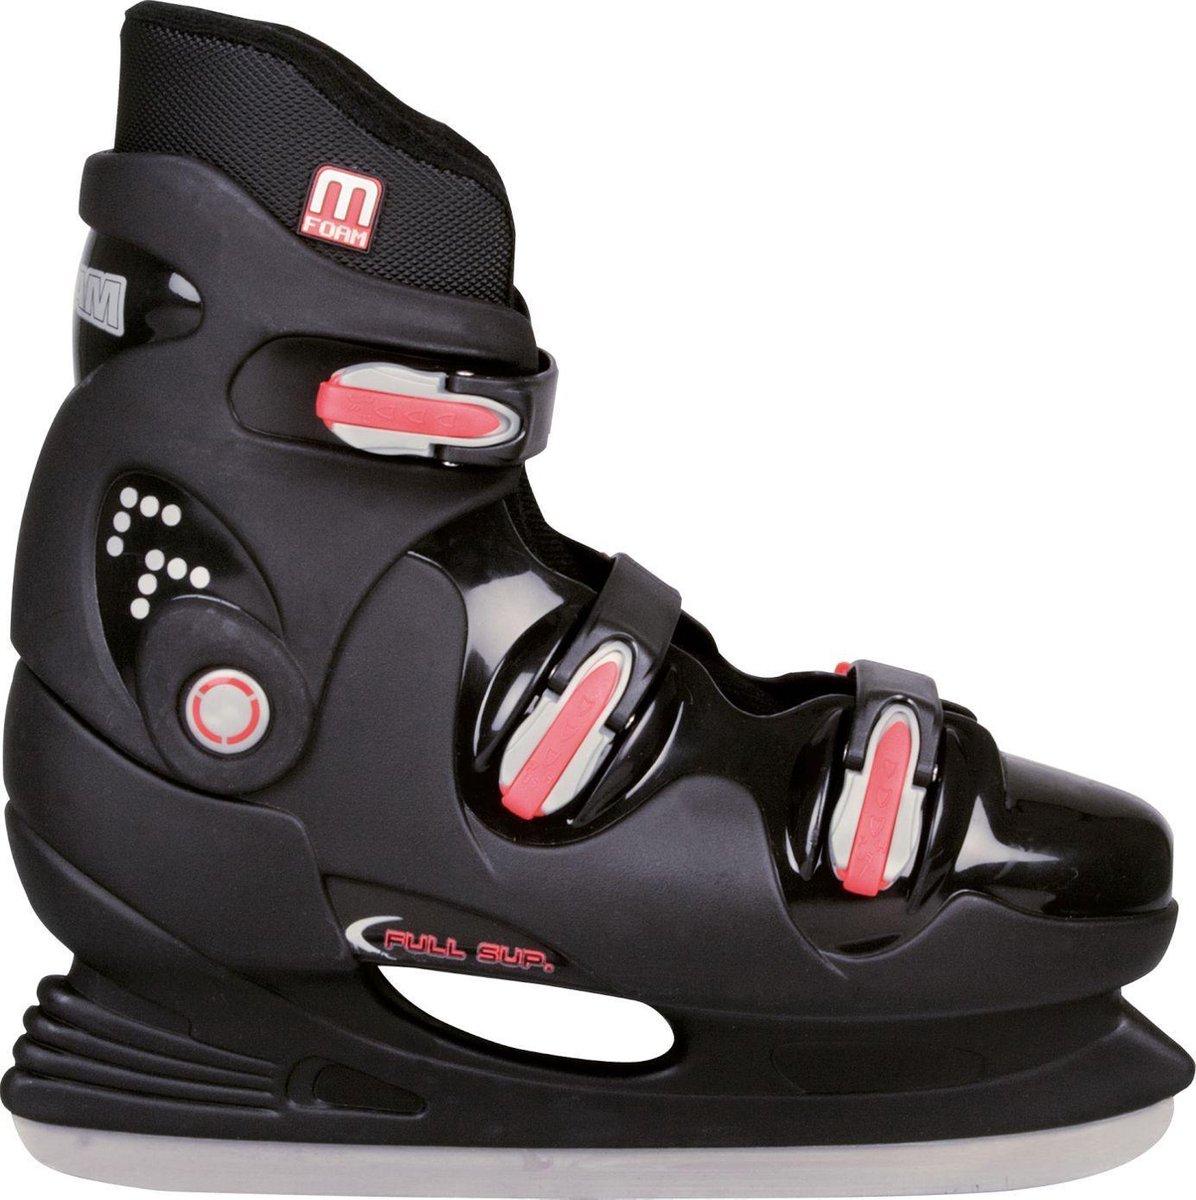 Nijdam IJshockeyschaats - Hardboot - Zwart/Zilver/Rood - 39